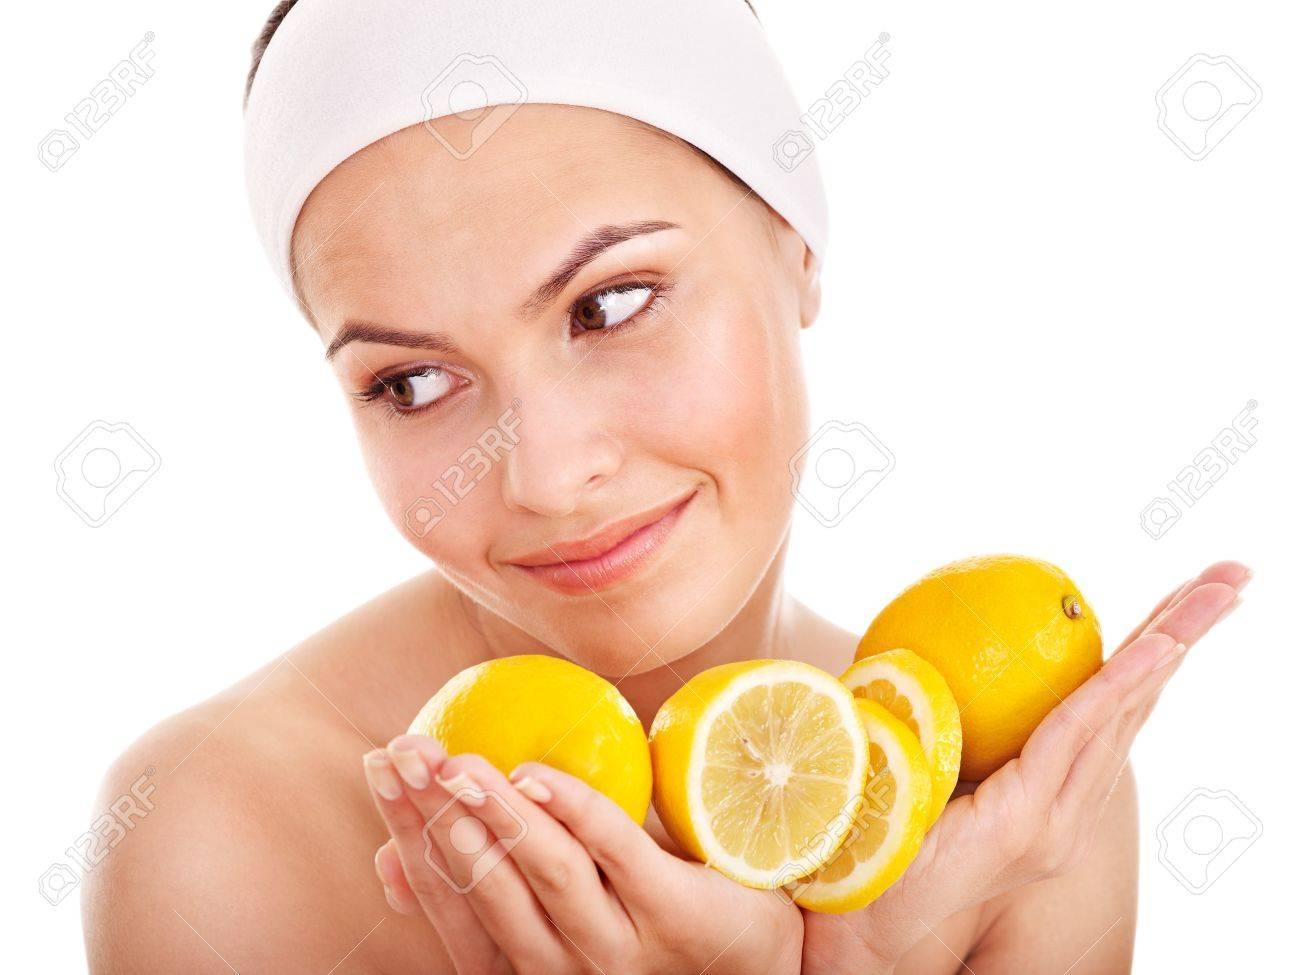 Natural homemade fruit facial masks . Isolated. - 11978556